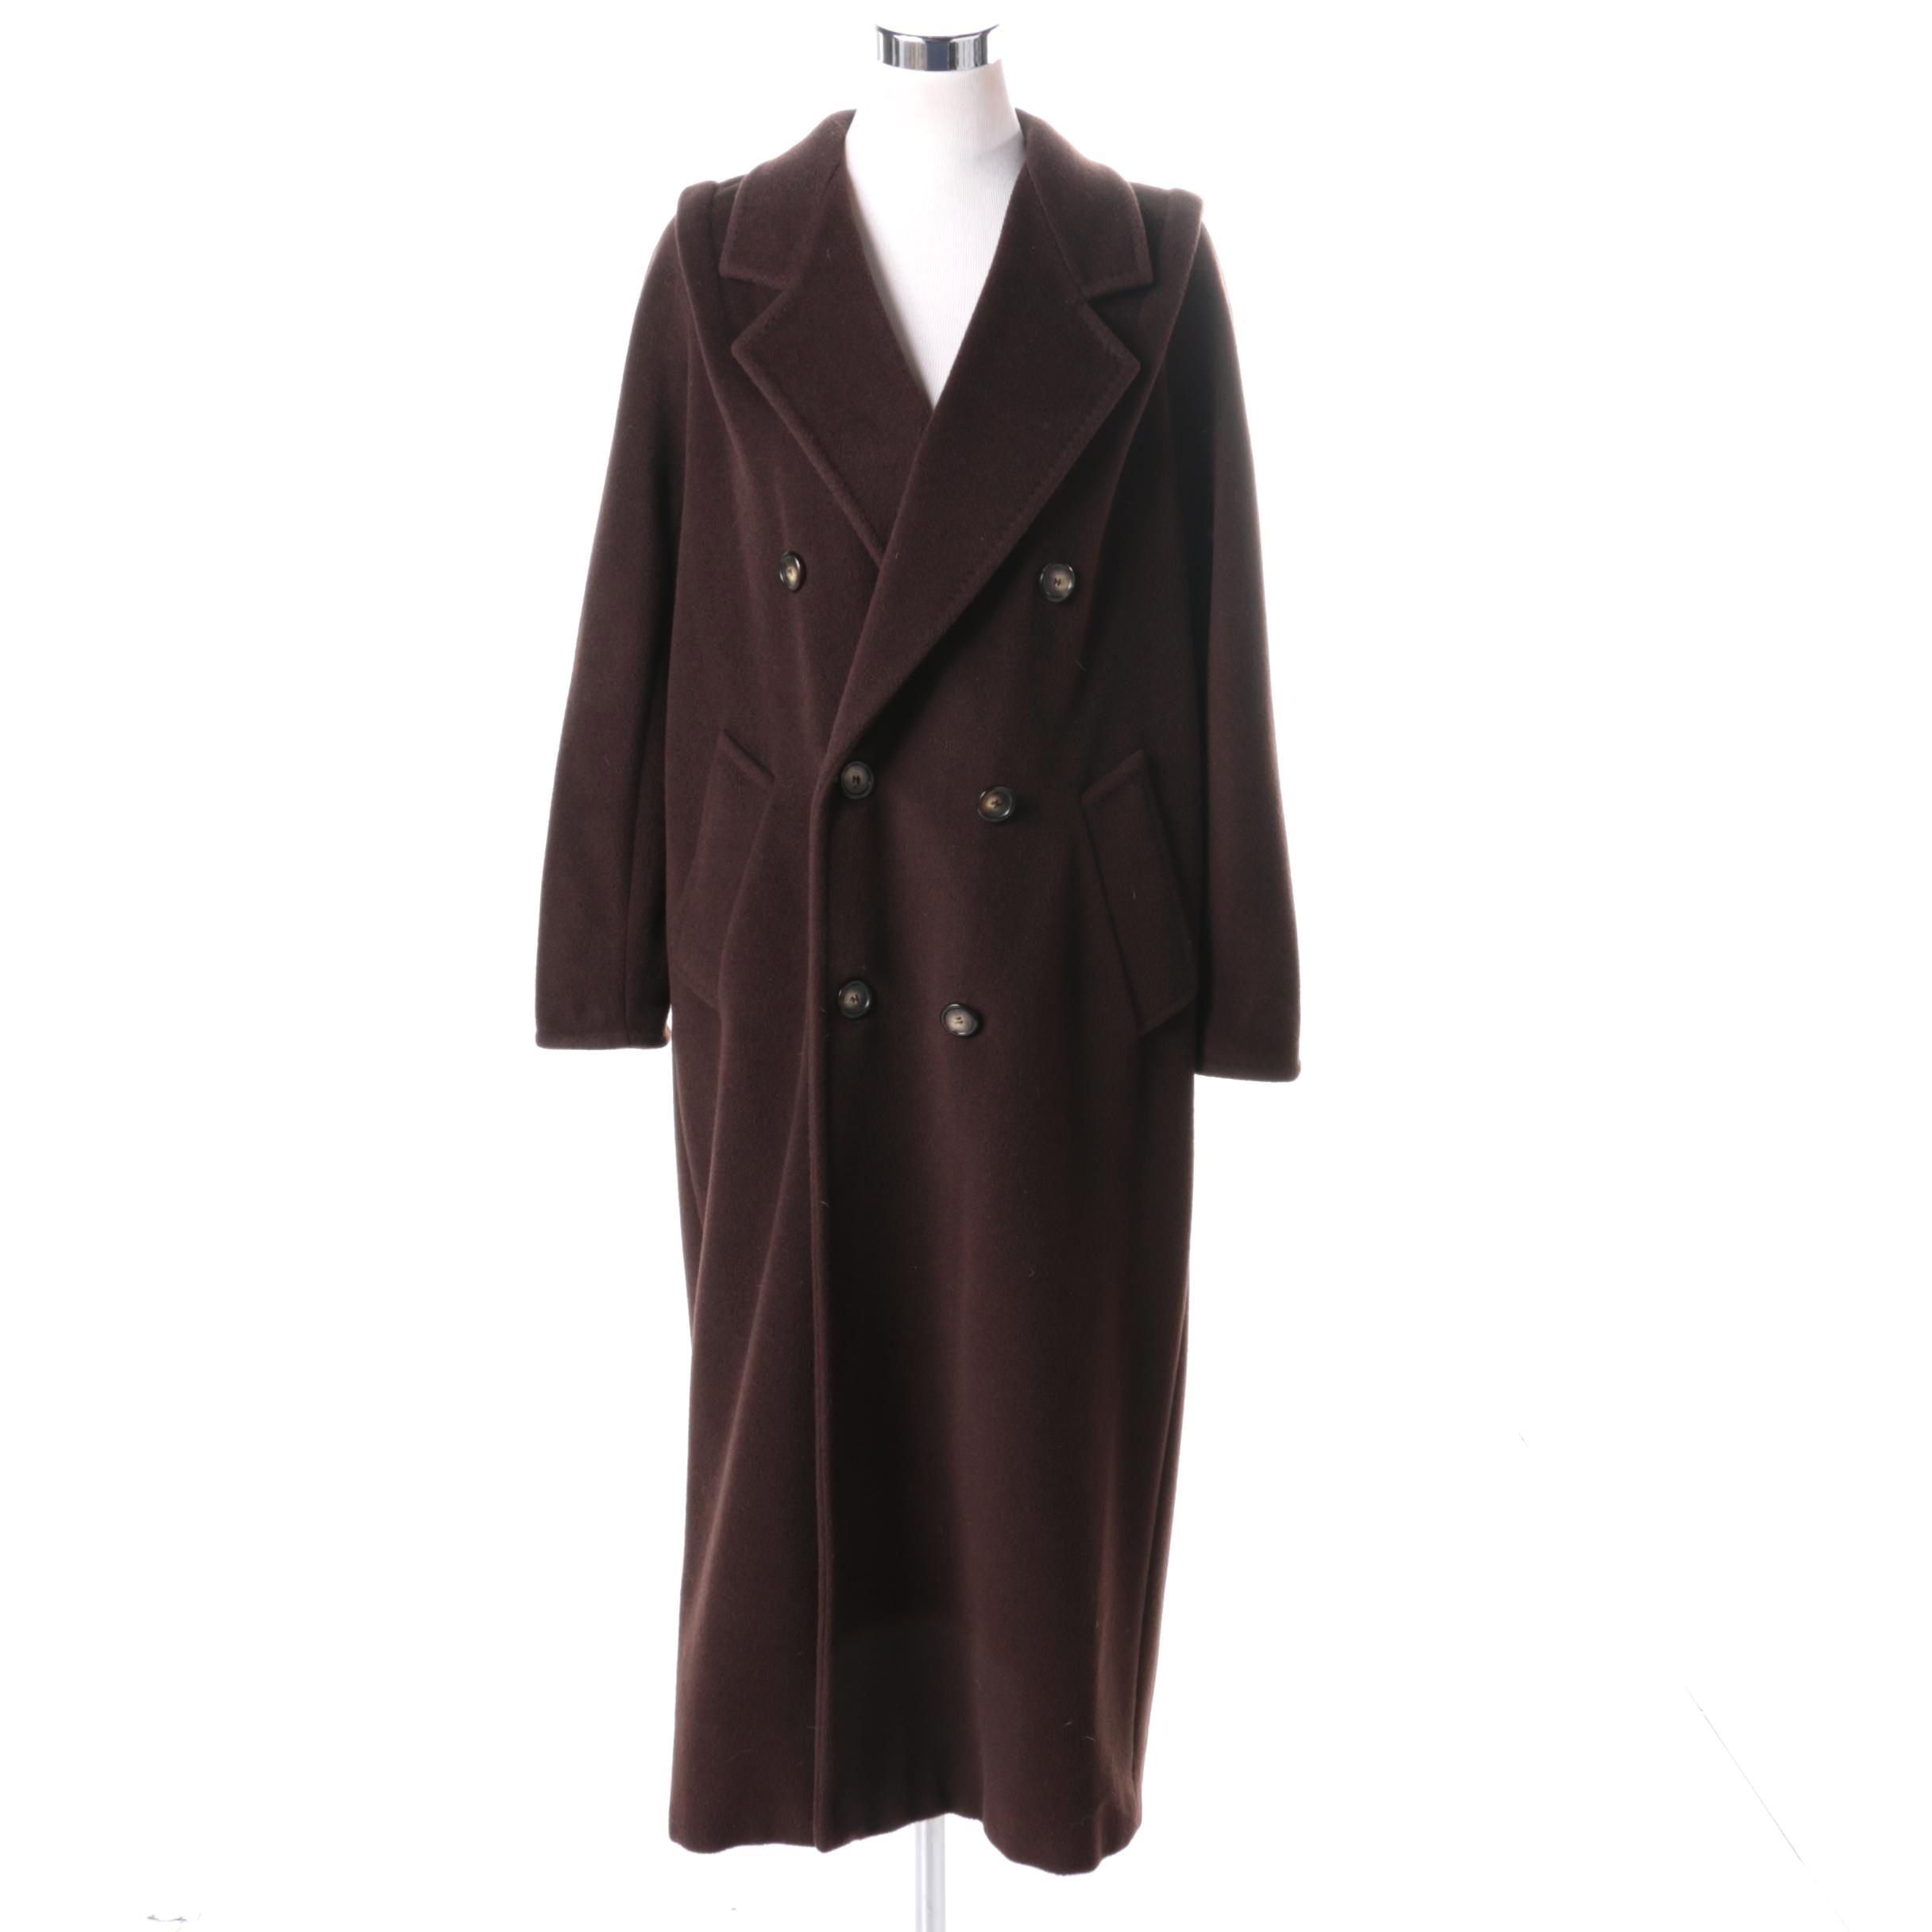 Max Mara Wool and Cashmere Blend Coat